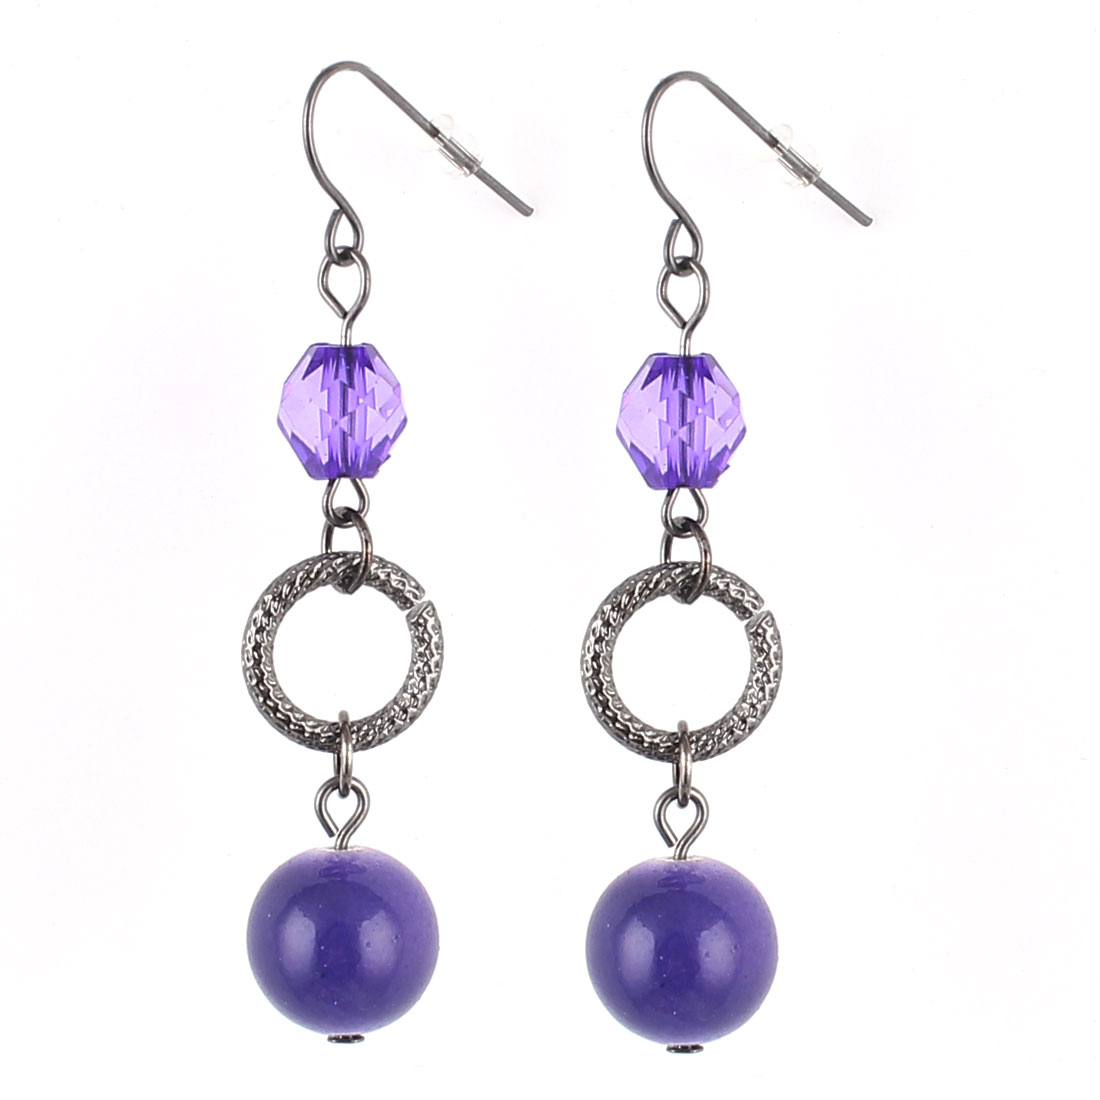 "2.4"" Length Purple Brown Plastic Lightweight Beads Pendant Metal Fish Hook Earrings Earbob Eardrop Pair for Lady Women"